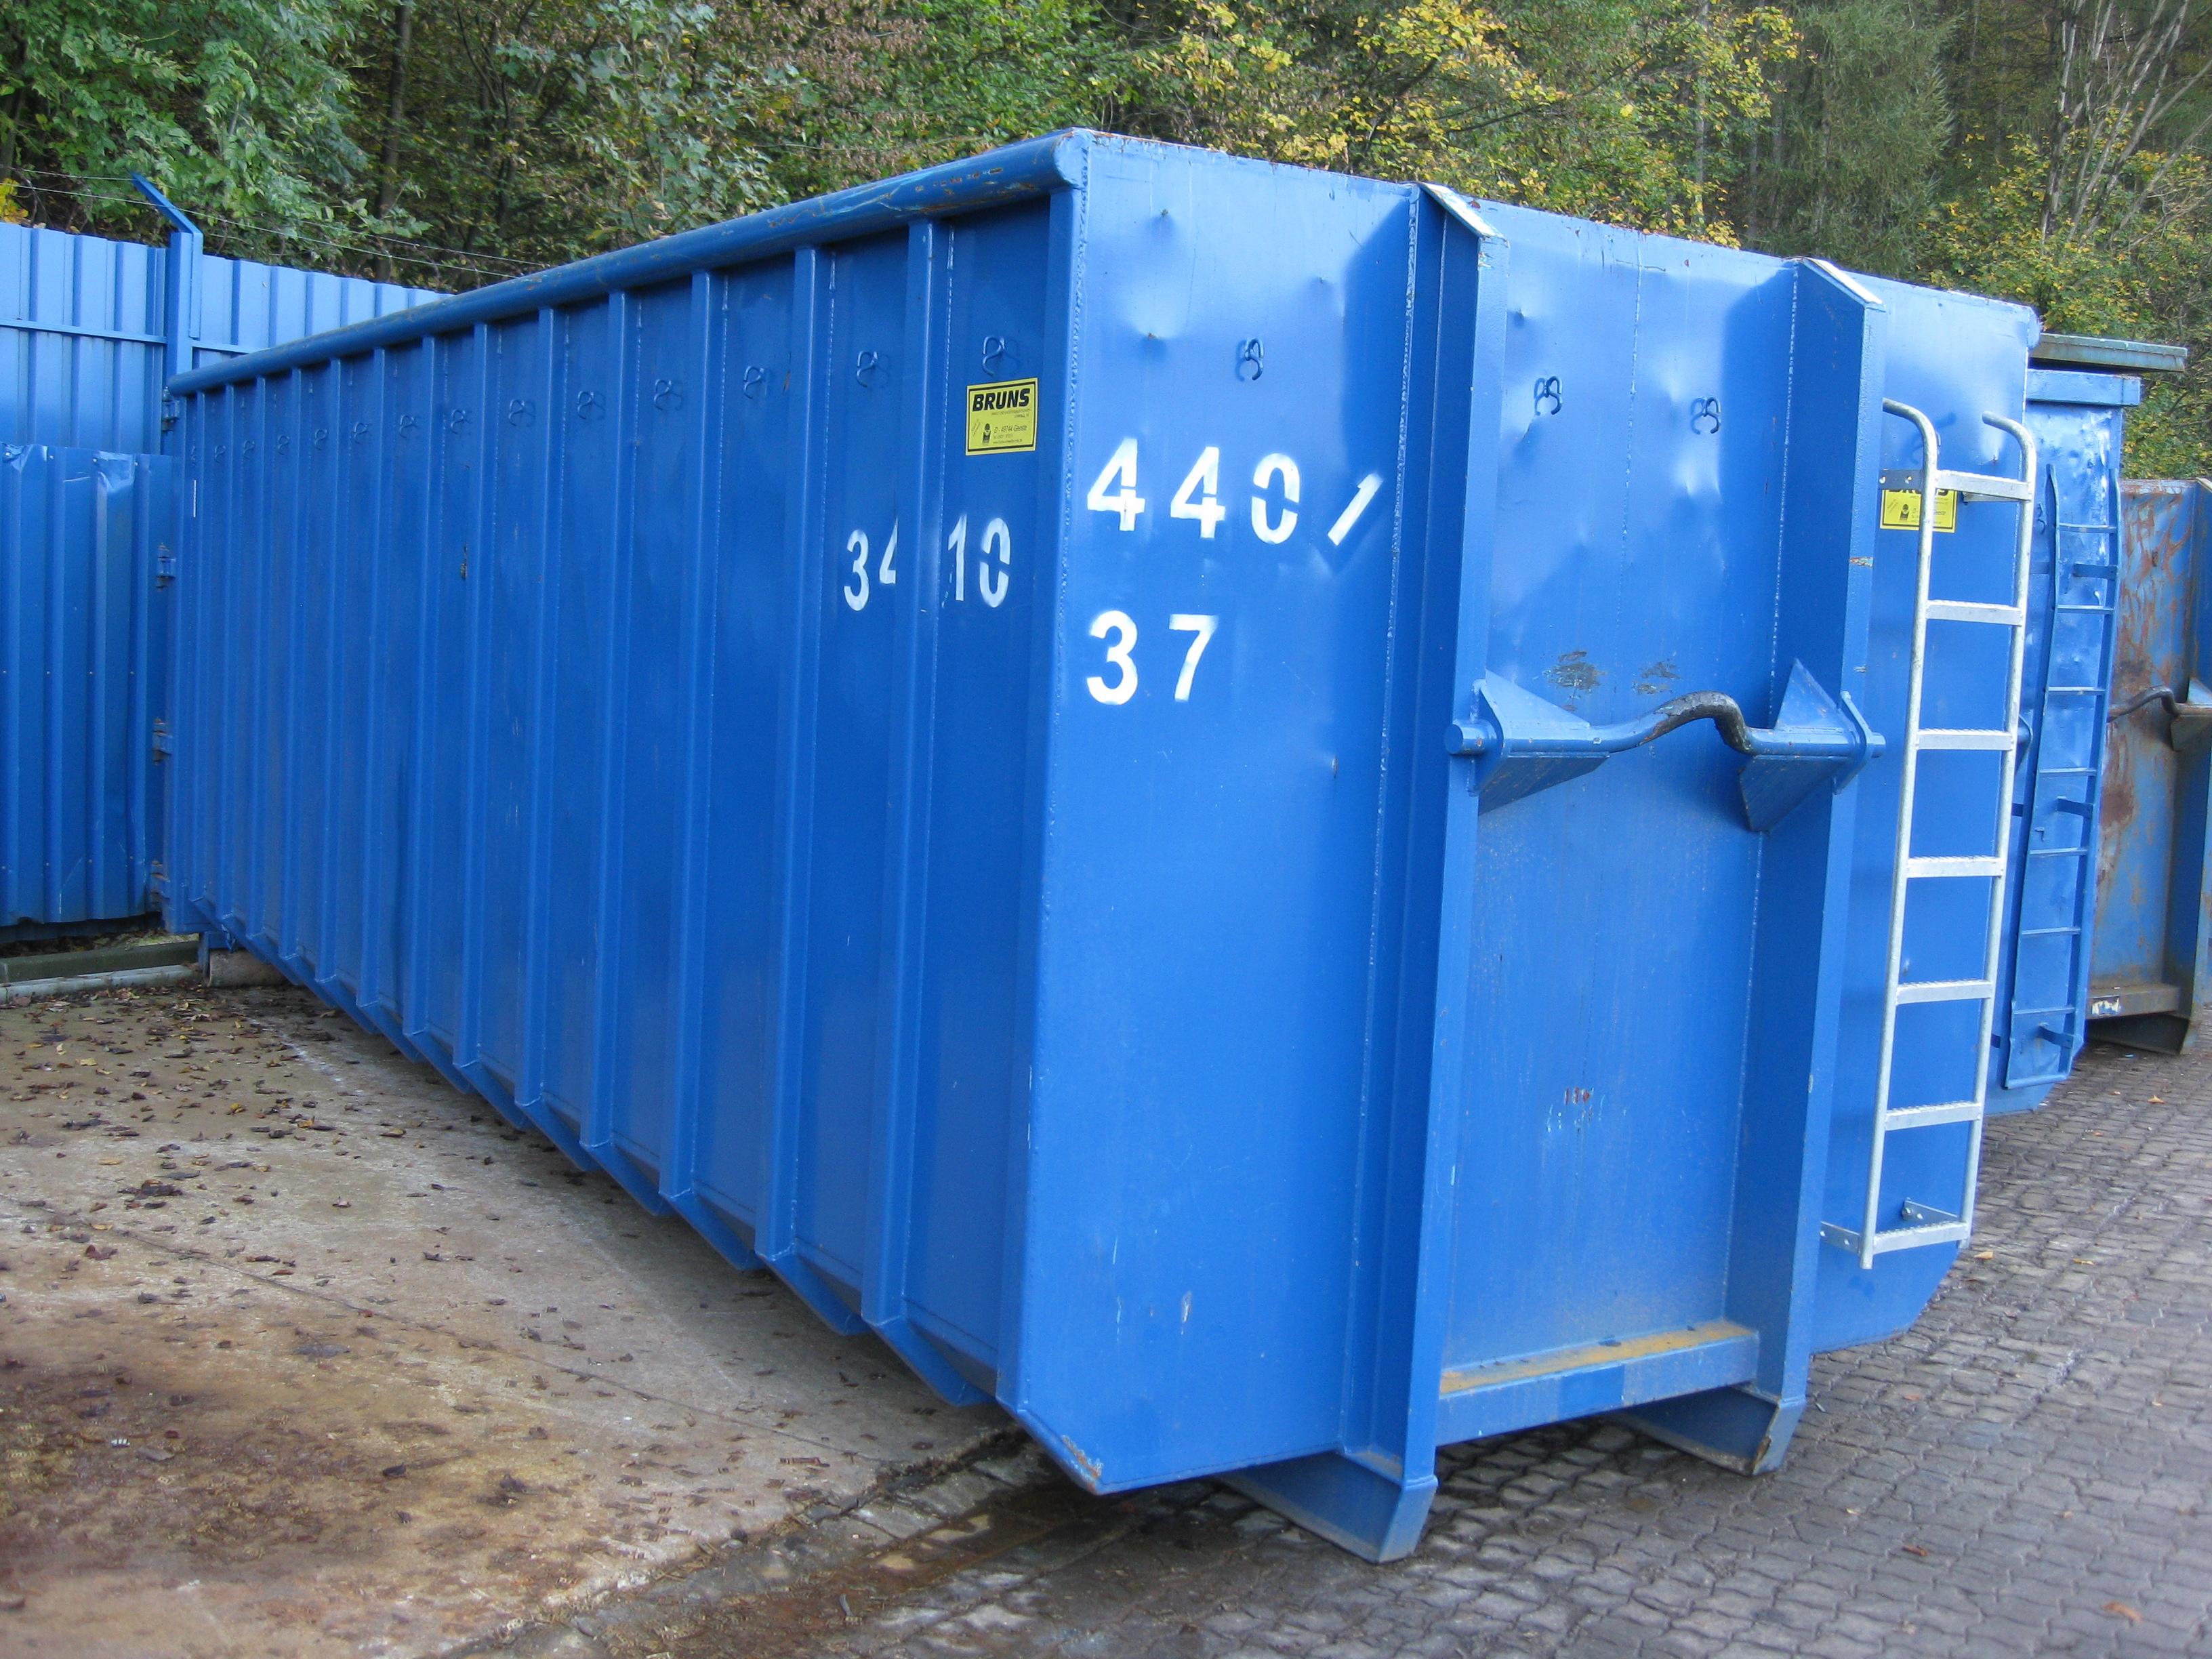 Abrollcontainer | Hossfeld GmbH in Engelskirchen